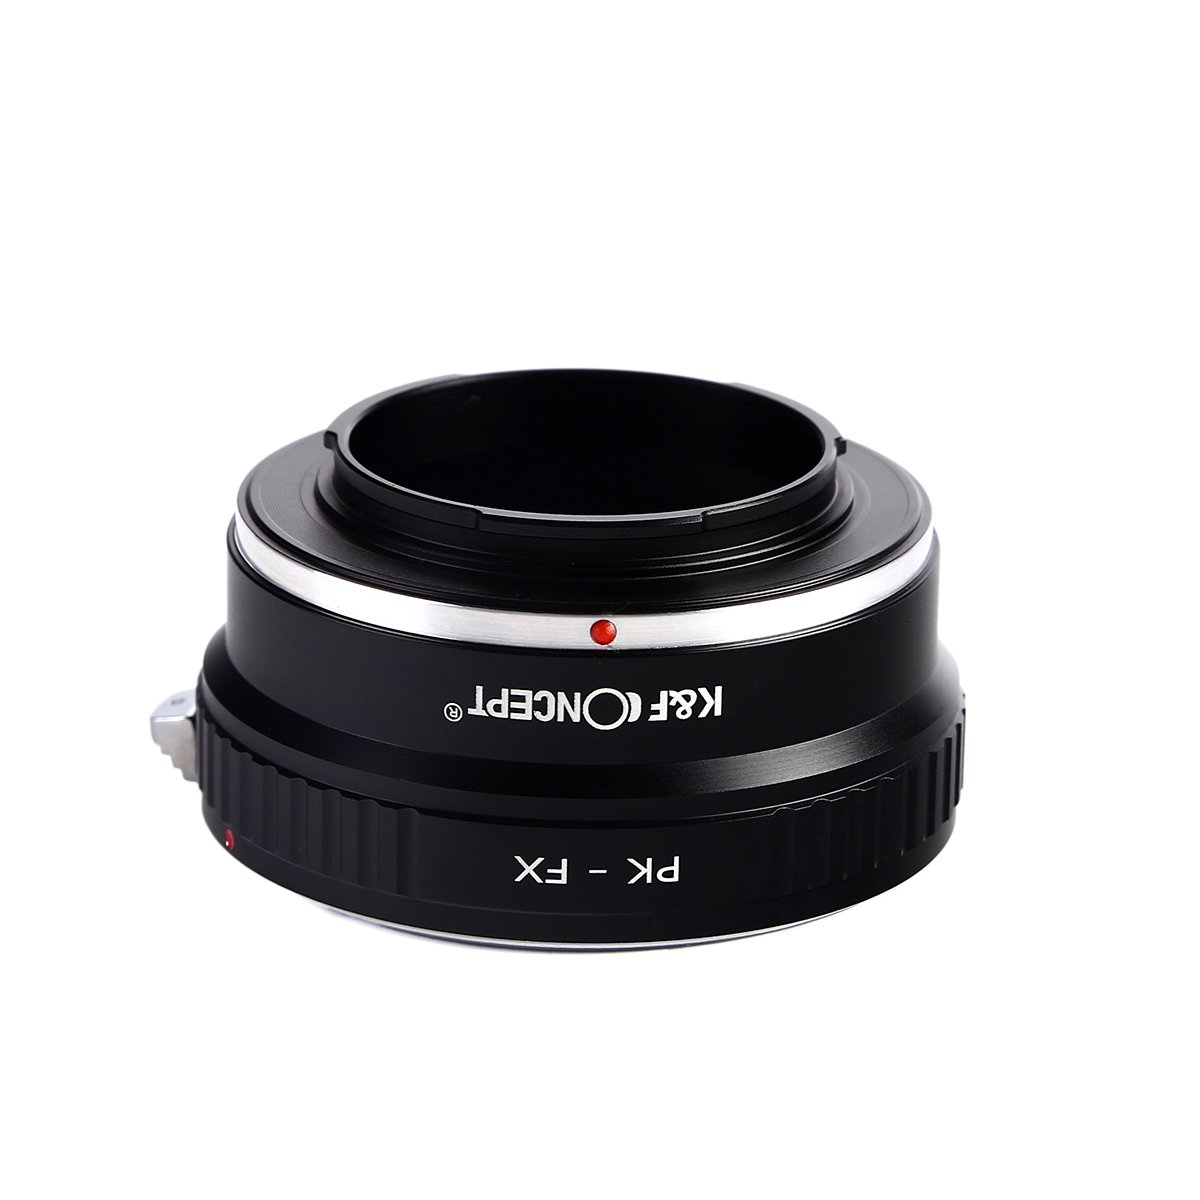 Beschoi Lens Mount Adapter for Pentax PK K Mount Lens to Fujifilm X-Series Mirrorless Camera Body Fits Fuji X-Pro2 X-E1 X-E2 X-M1 X-A1 X-A2 X-A3 X-A10 X-M1 X-T1 X-T2 X-T10